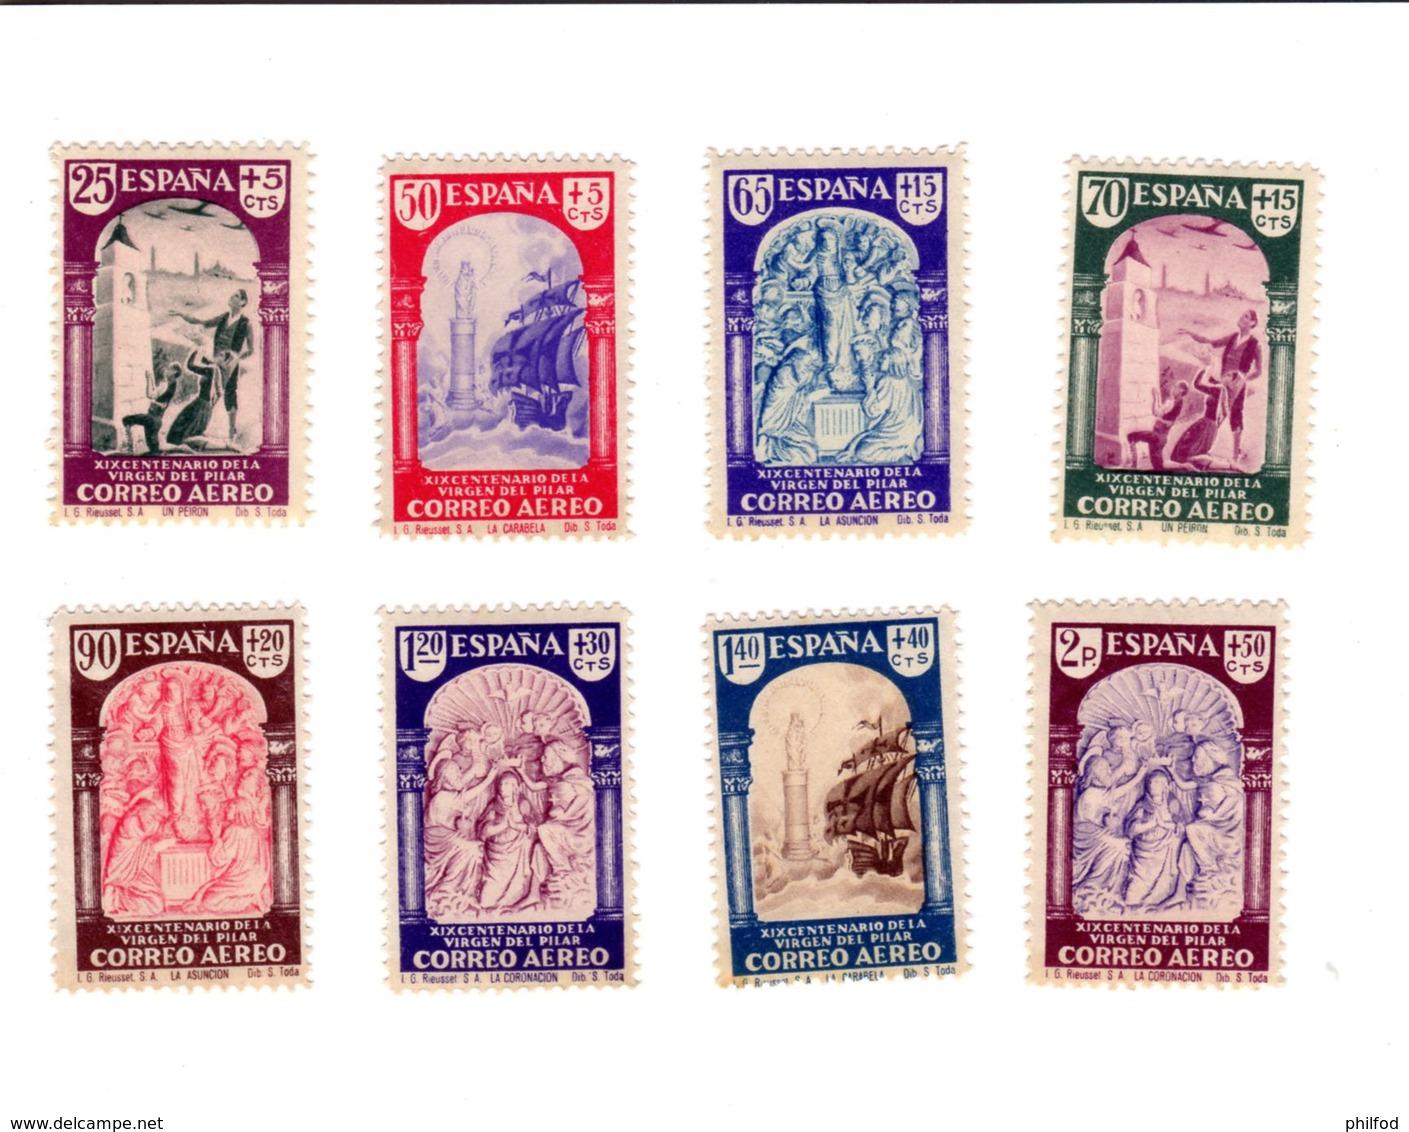 Espagne - 1940 - Virgen Del Pilar - CORREO AEREO - Série - 1931-50 Unused Stamps